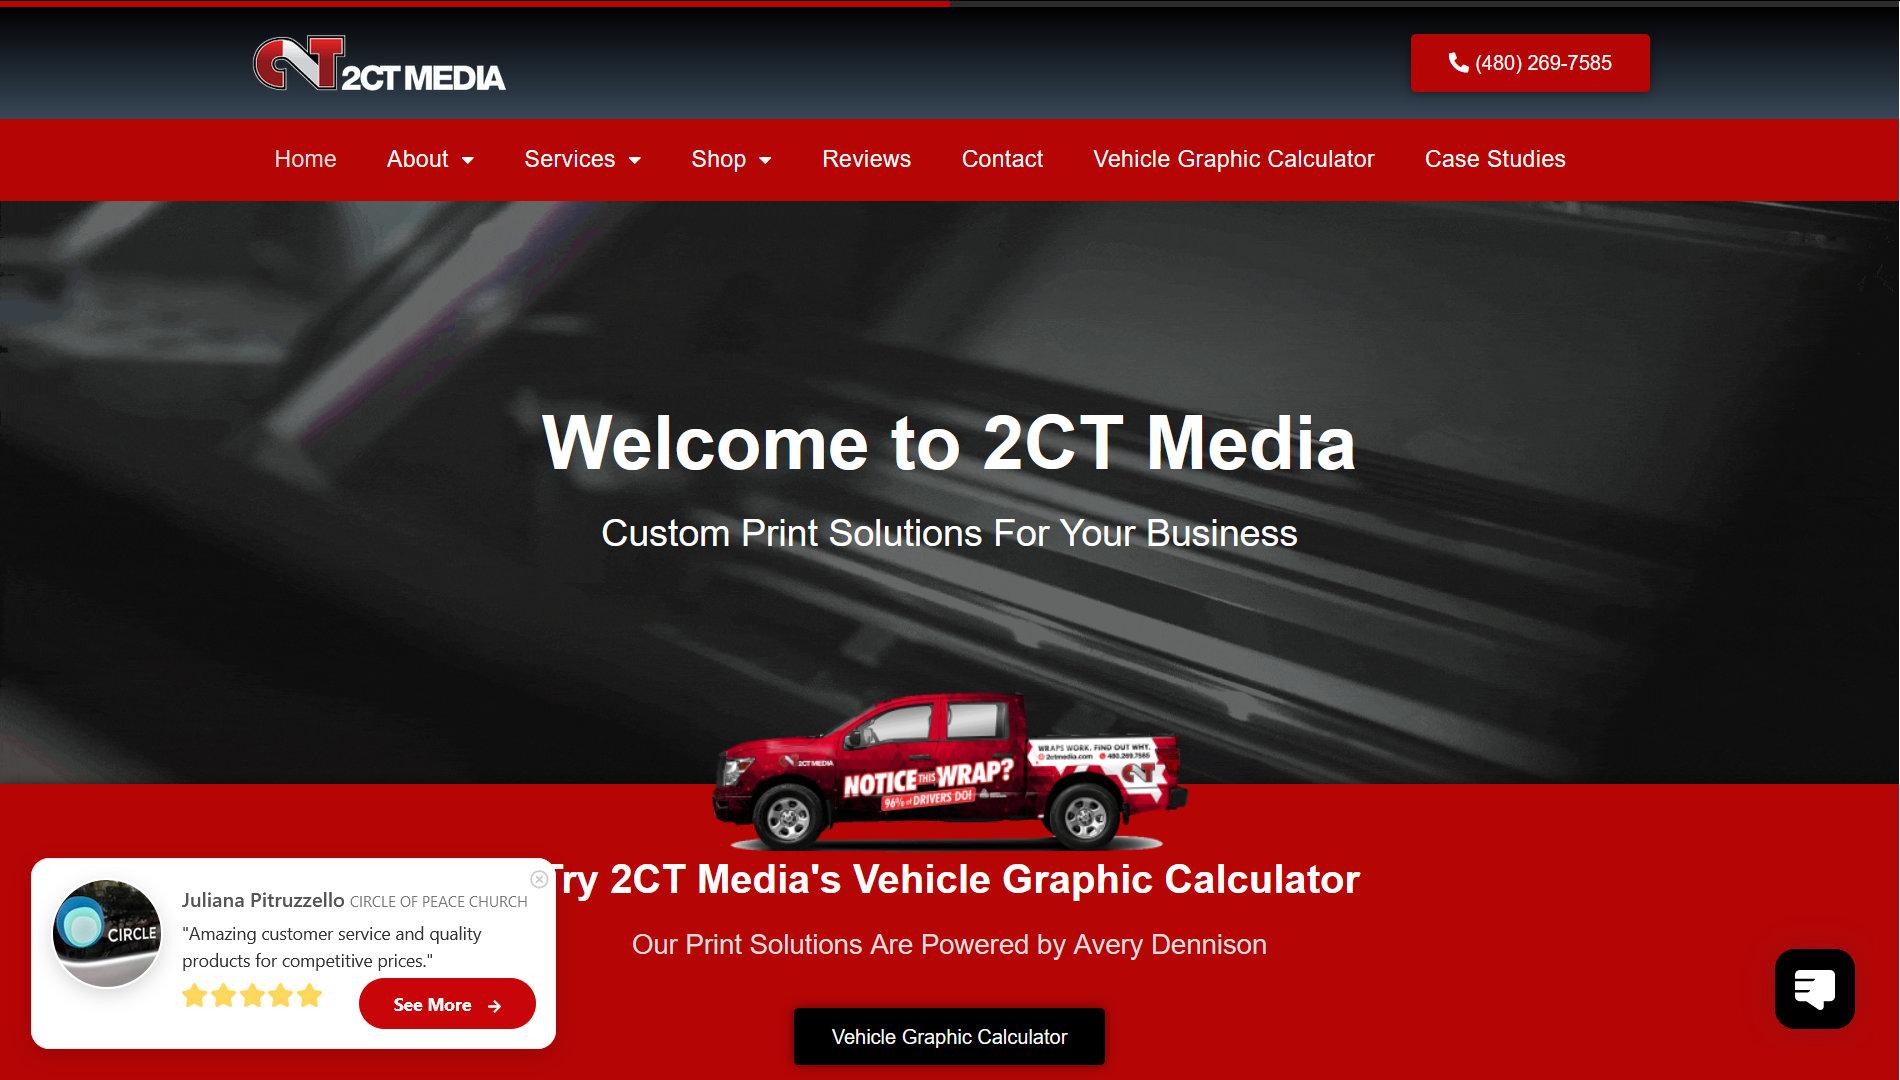 2CT Media in Mesa